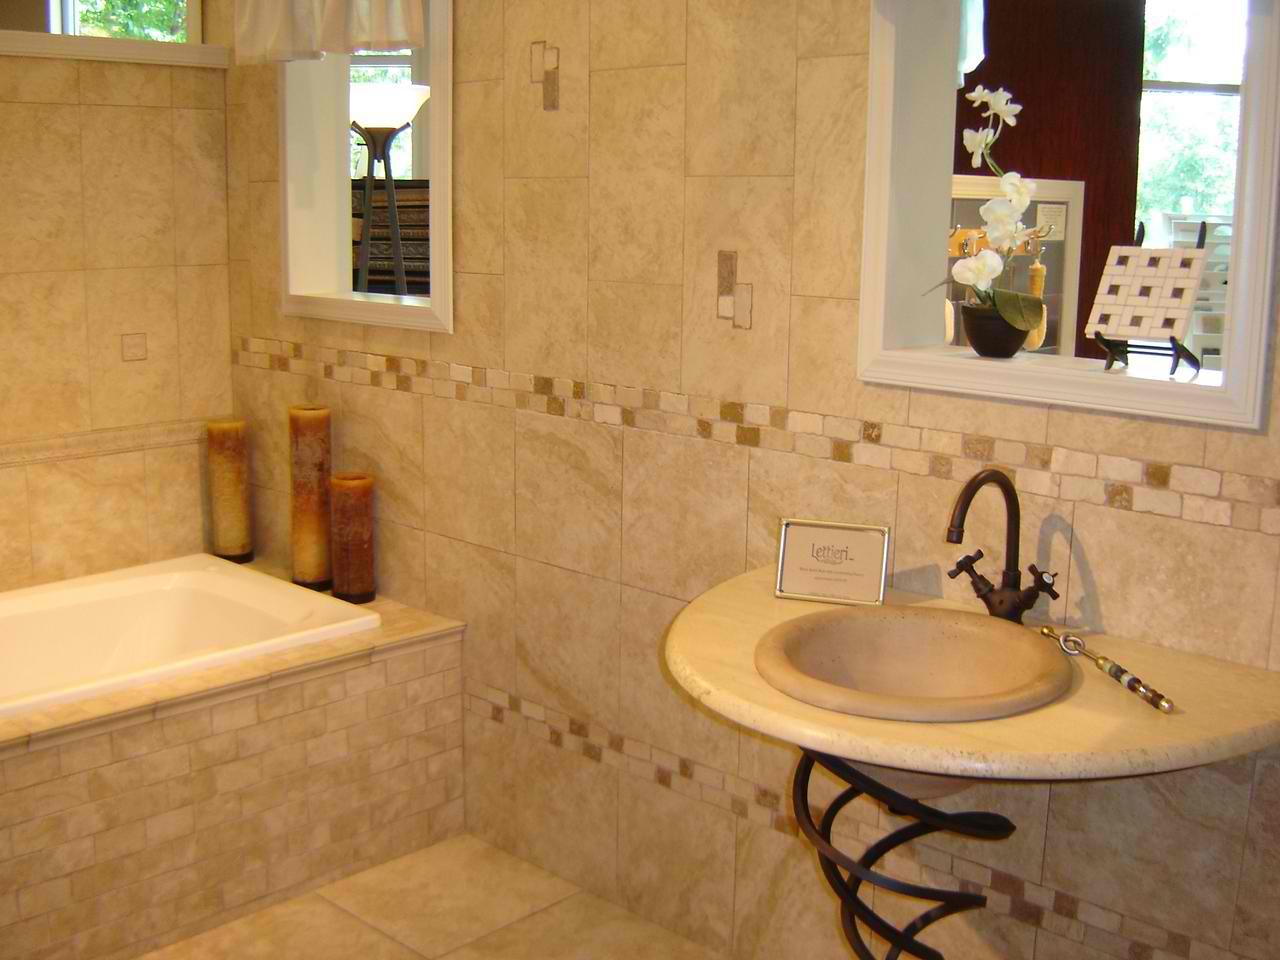 Amazing Bathroom Tile Design Ideas For Small Bathrooms And bathroom tile design ideas for small bathrooms